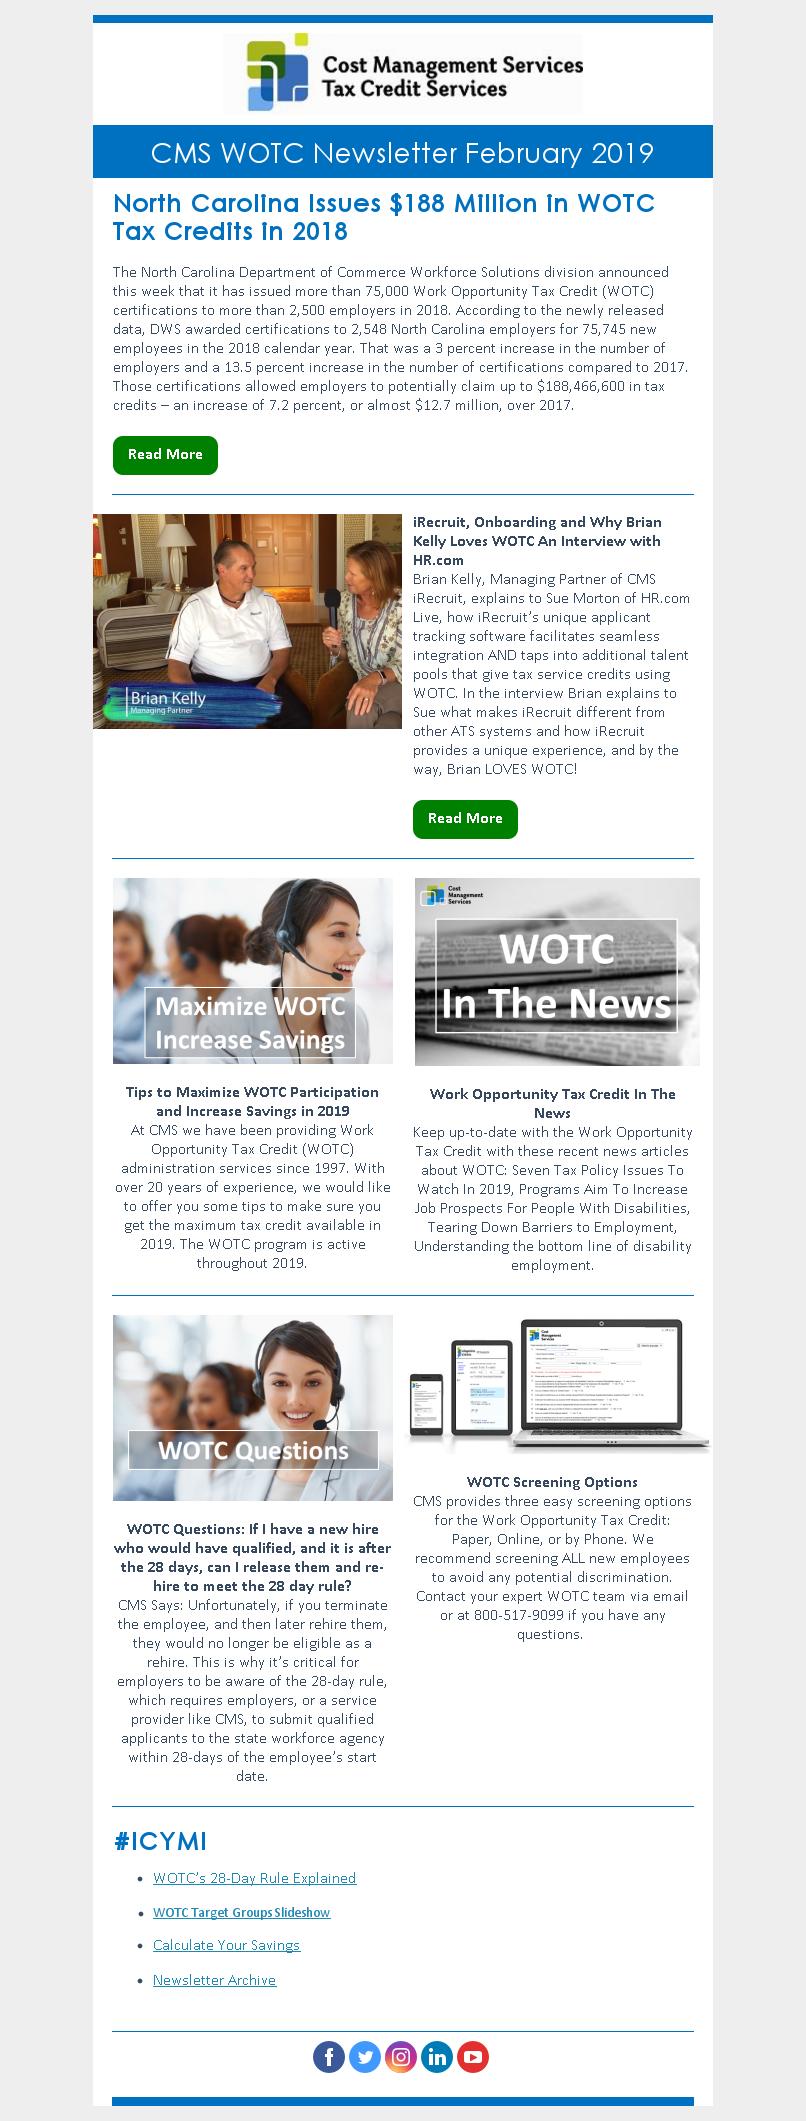 WOTC Customer Newsletter February 2019